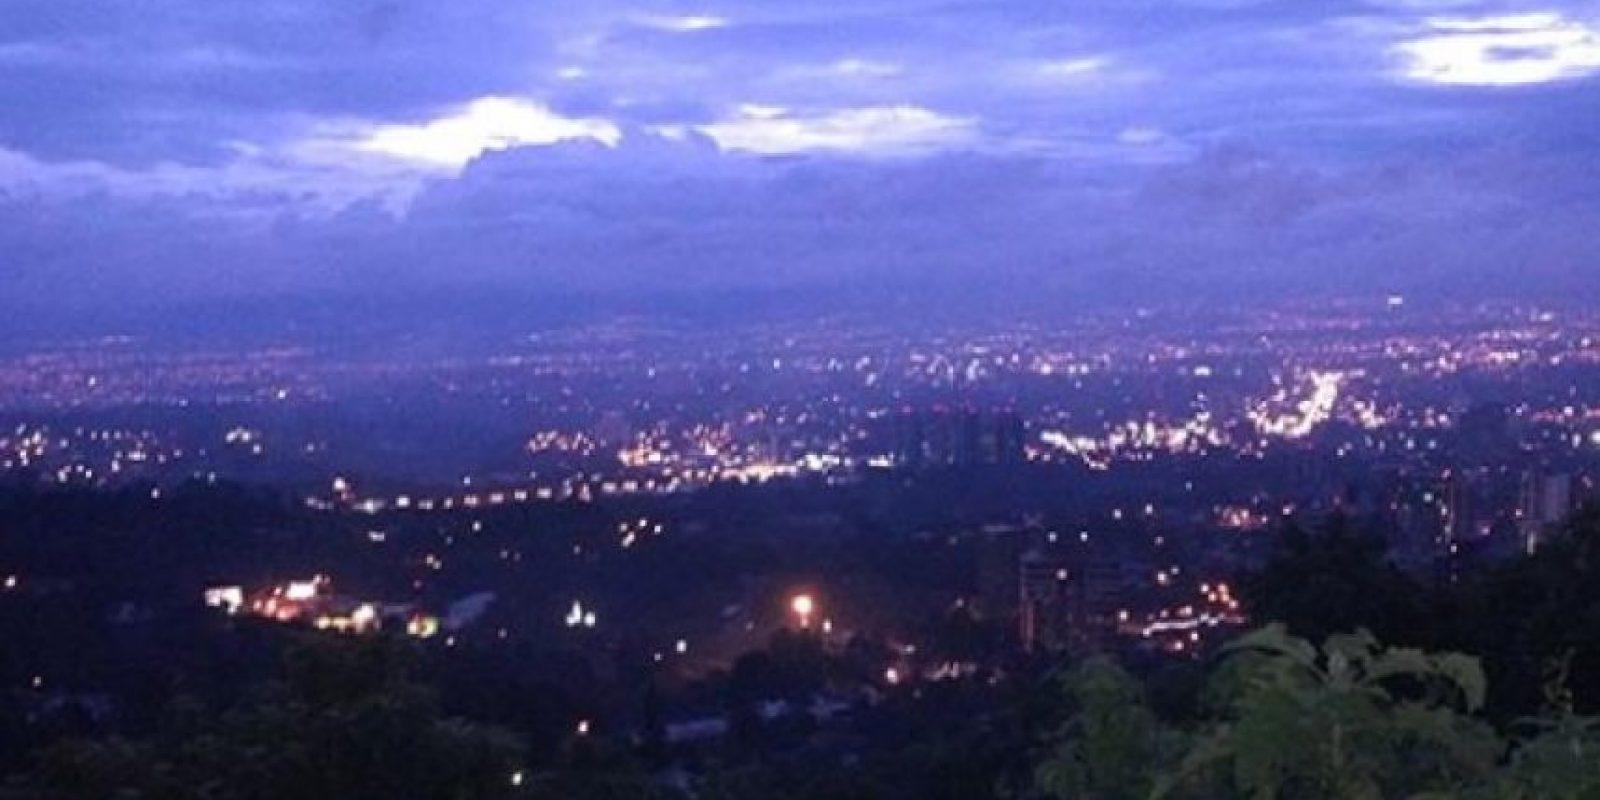 Nombre de Foto:El mirador, Carretera a el Salvador (Hermosa vista) Nombre persona: René E. Hernández C.